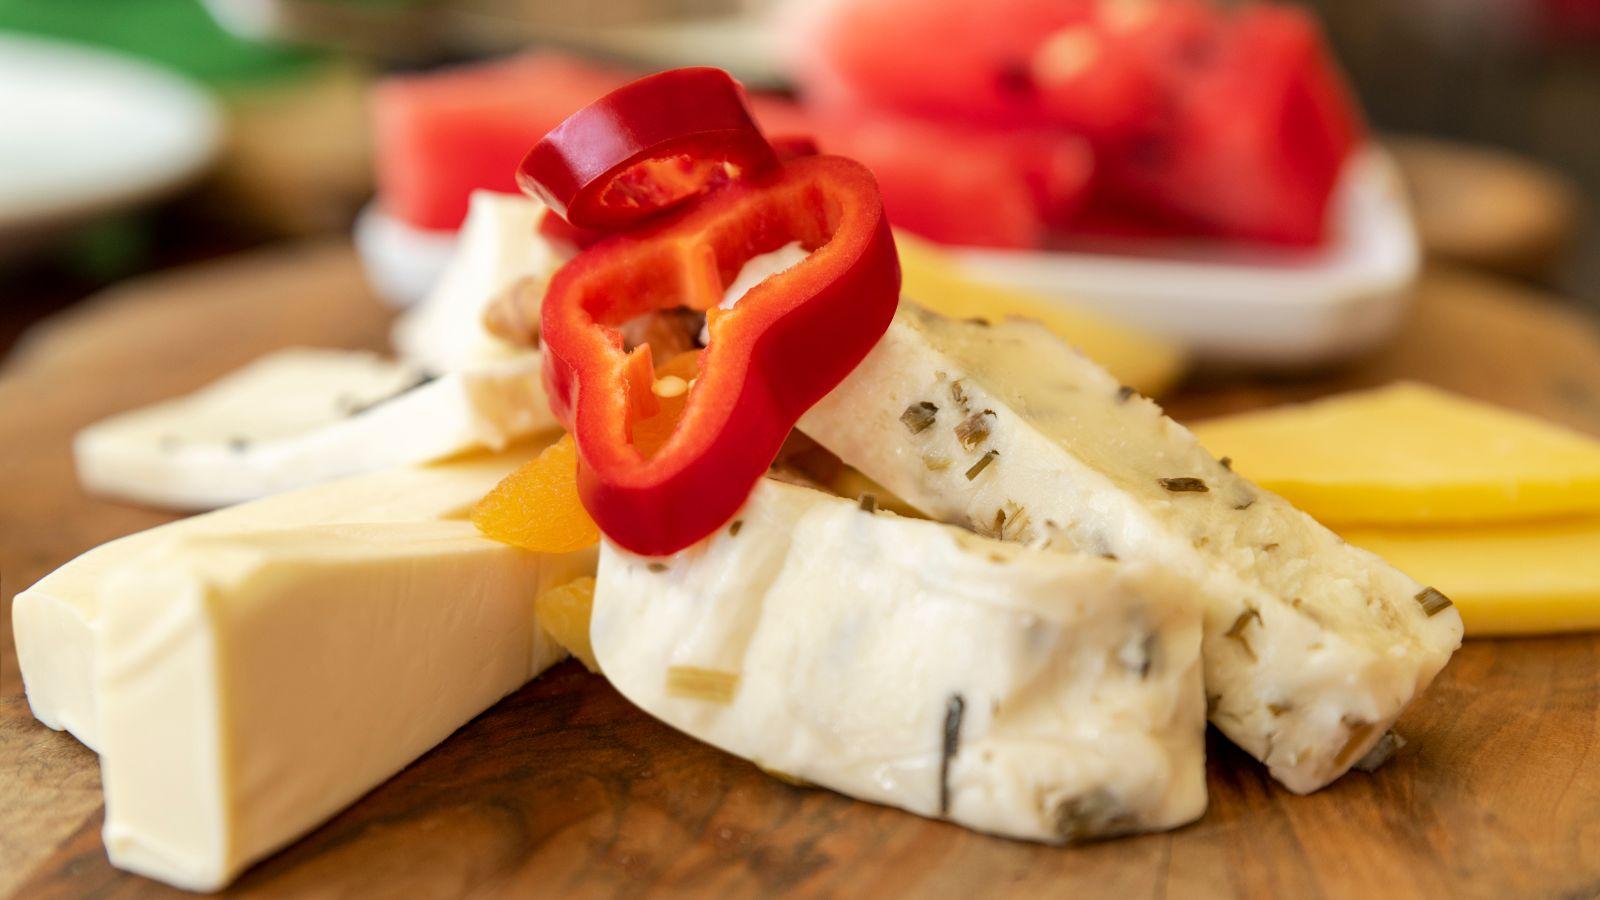 chillis on cheese